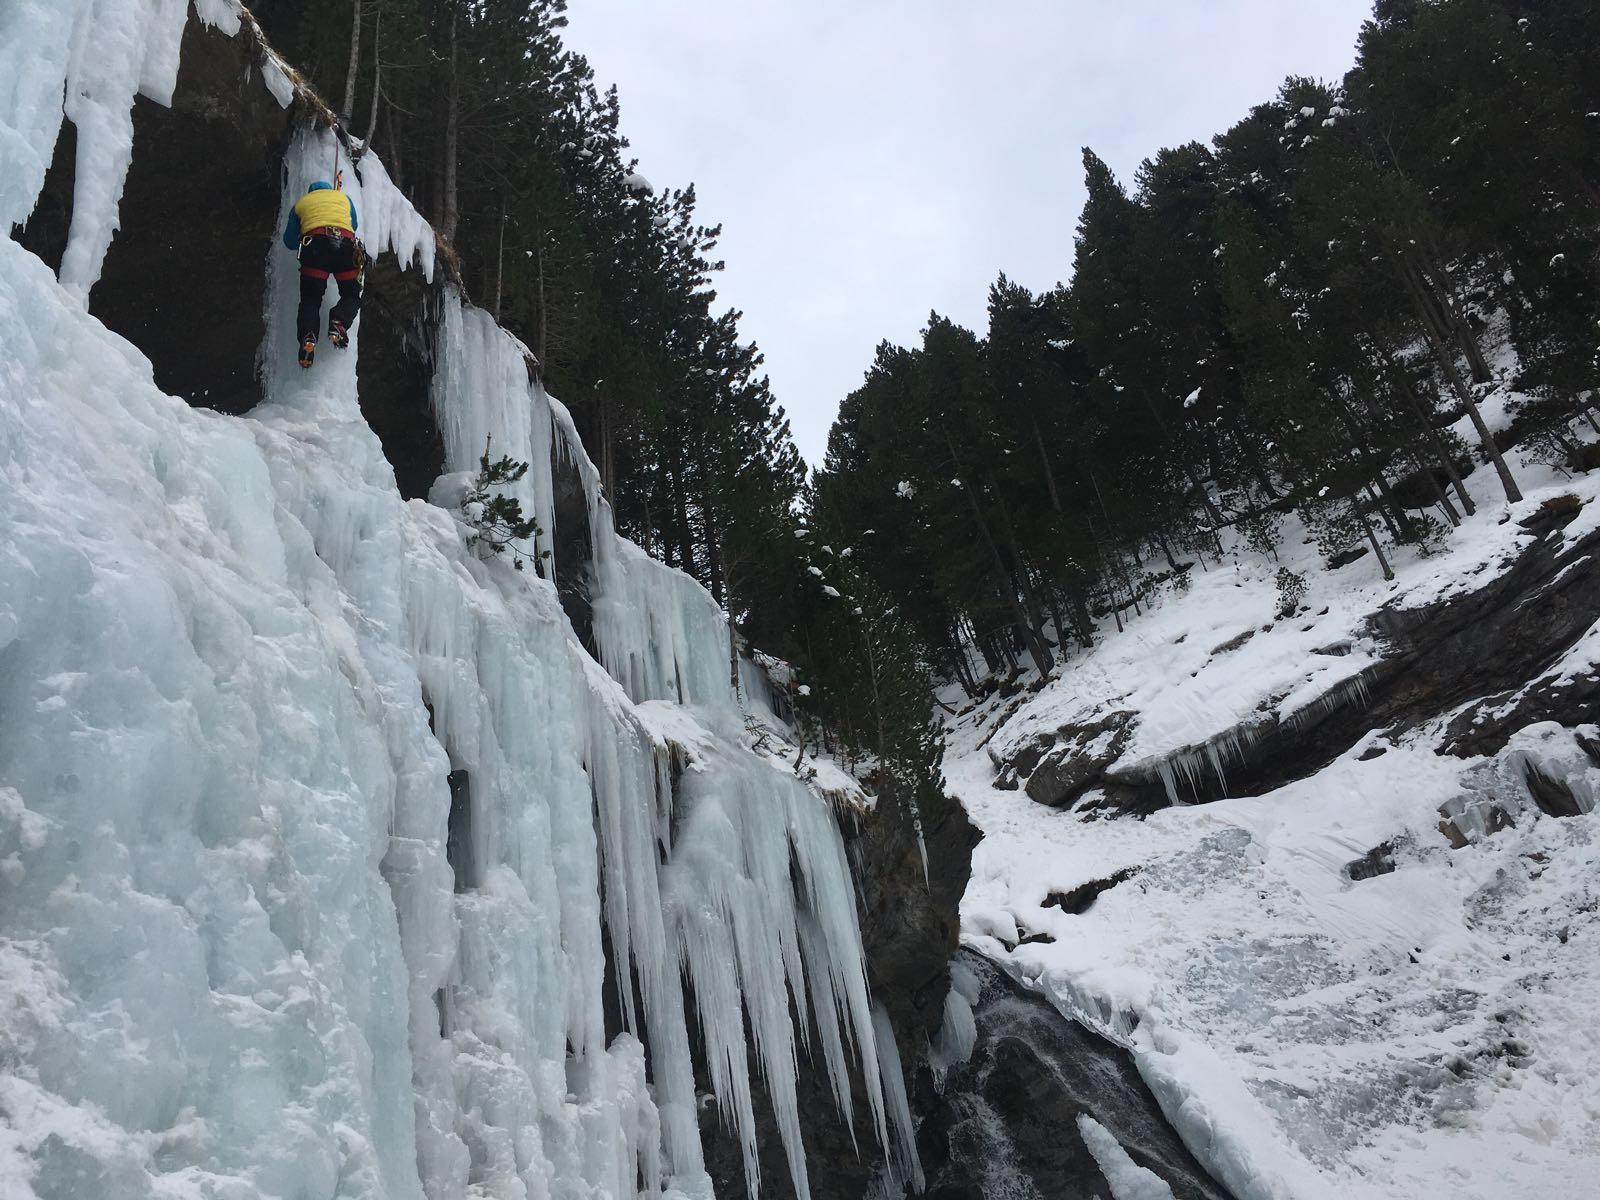 Curso de escalada en hielo (Pirineo Aragonés)